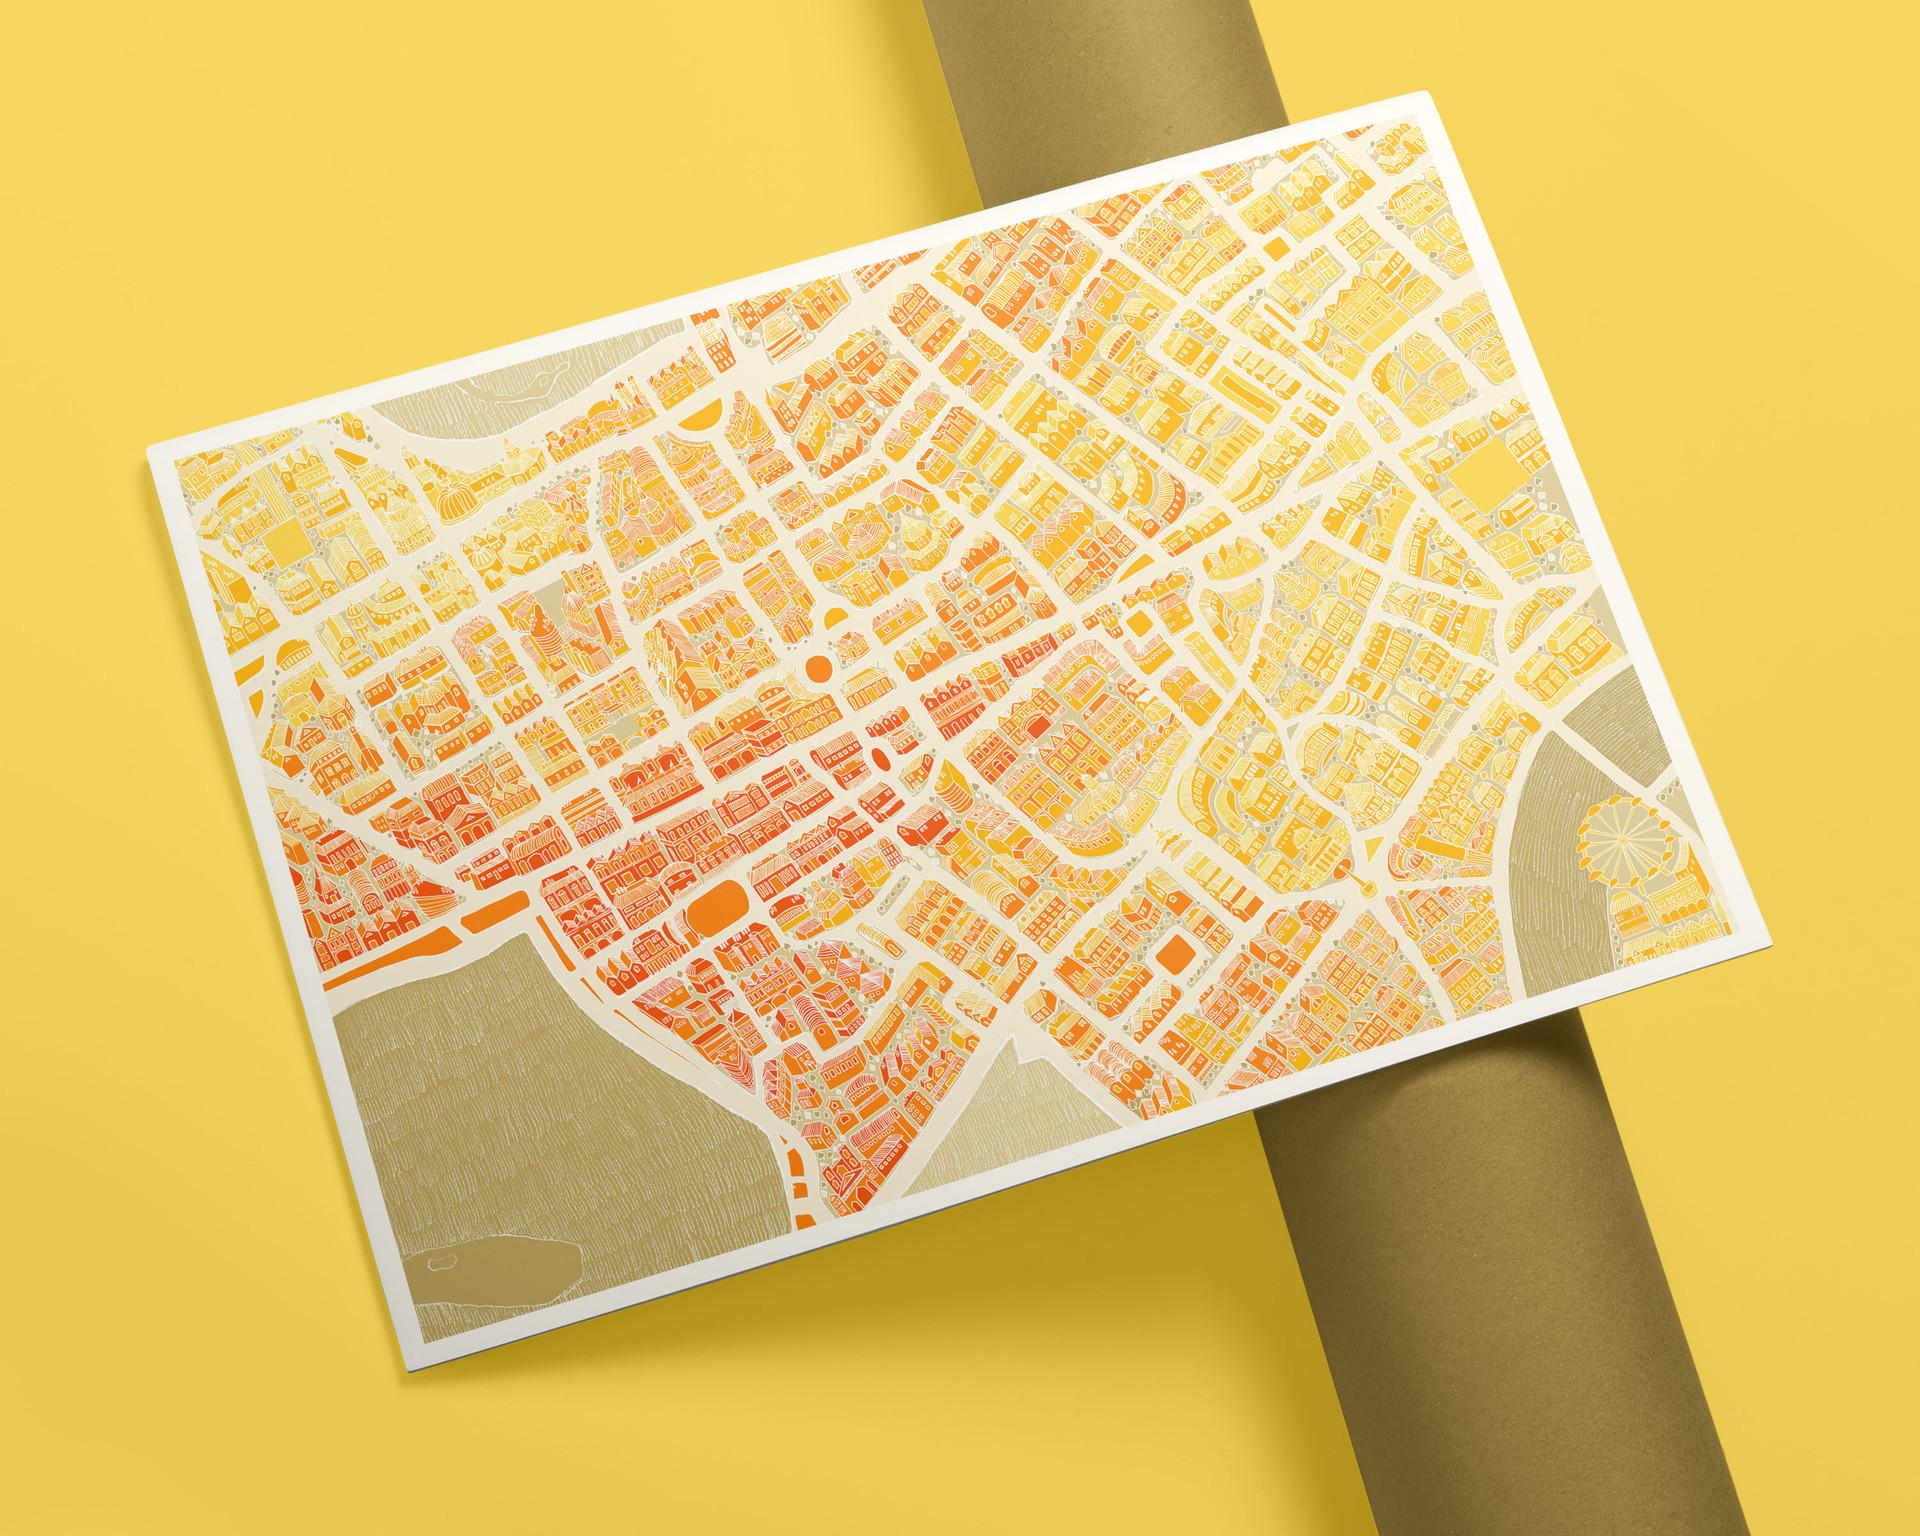 map print 1.jpg